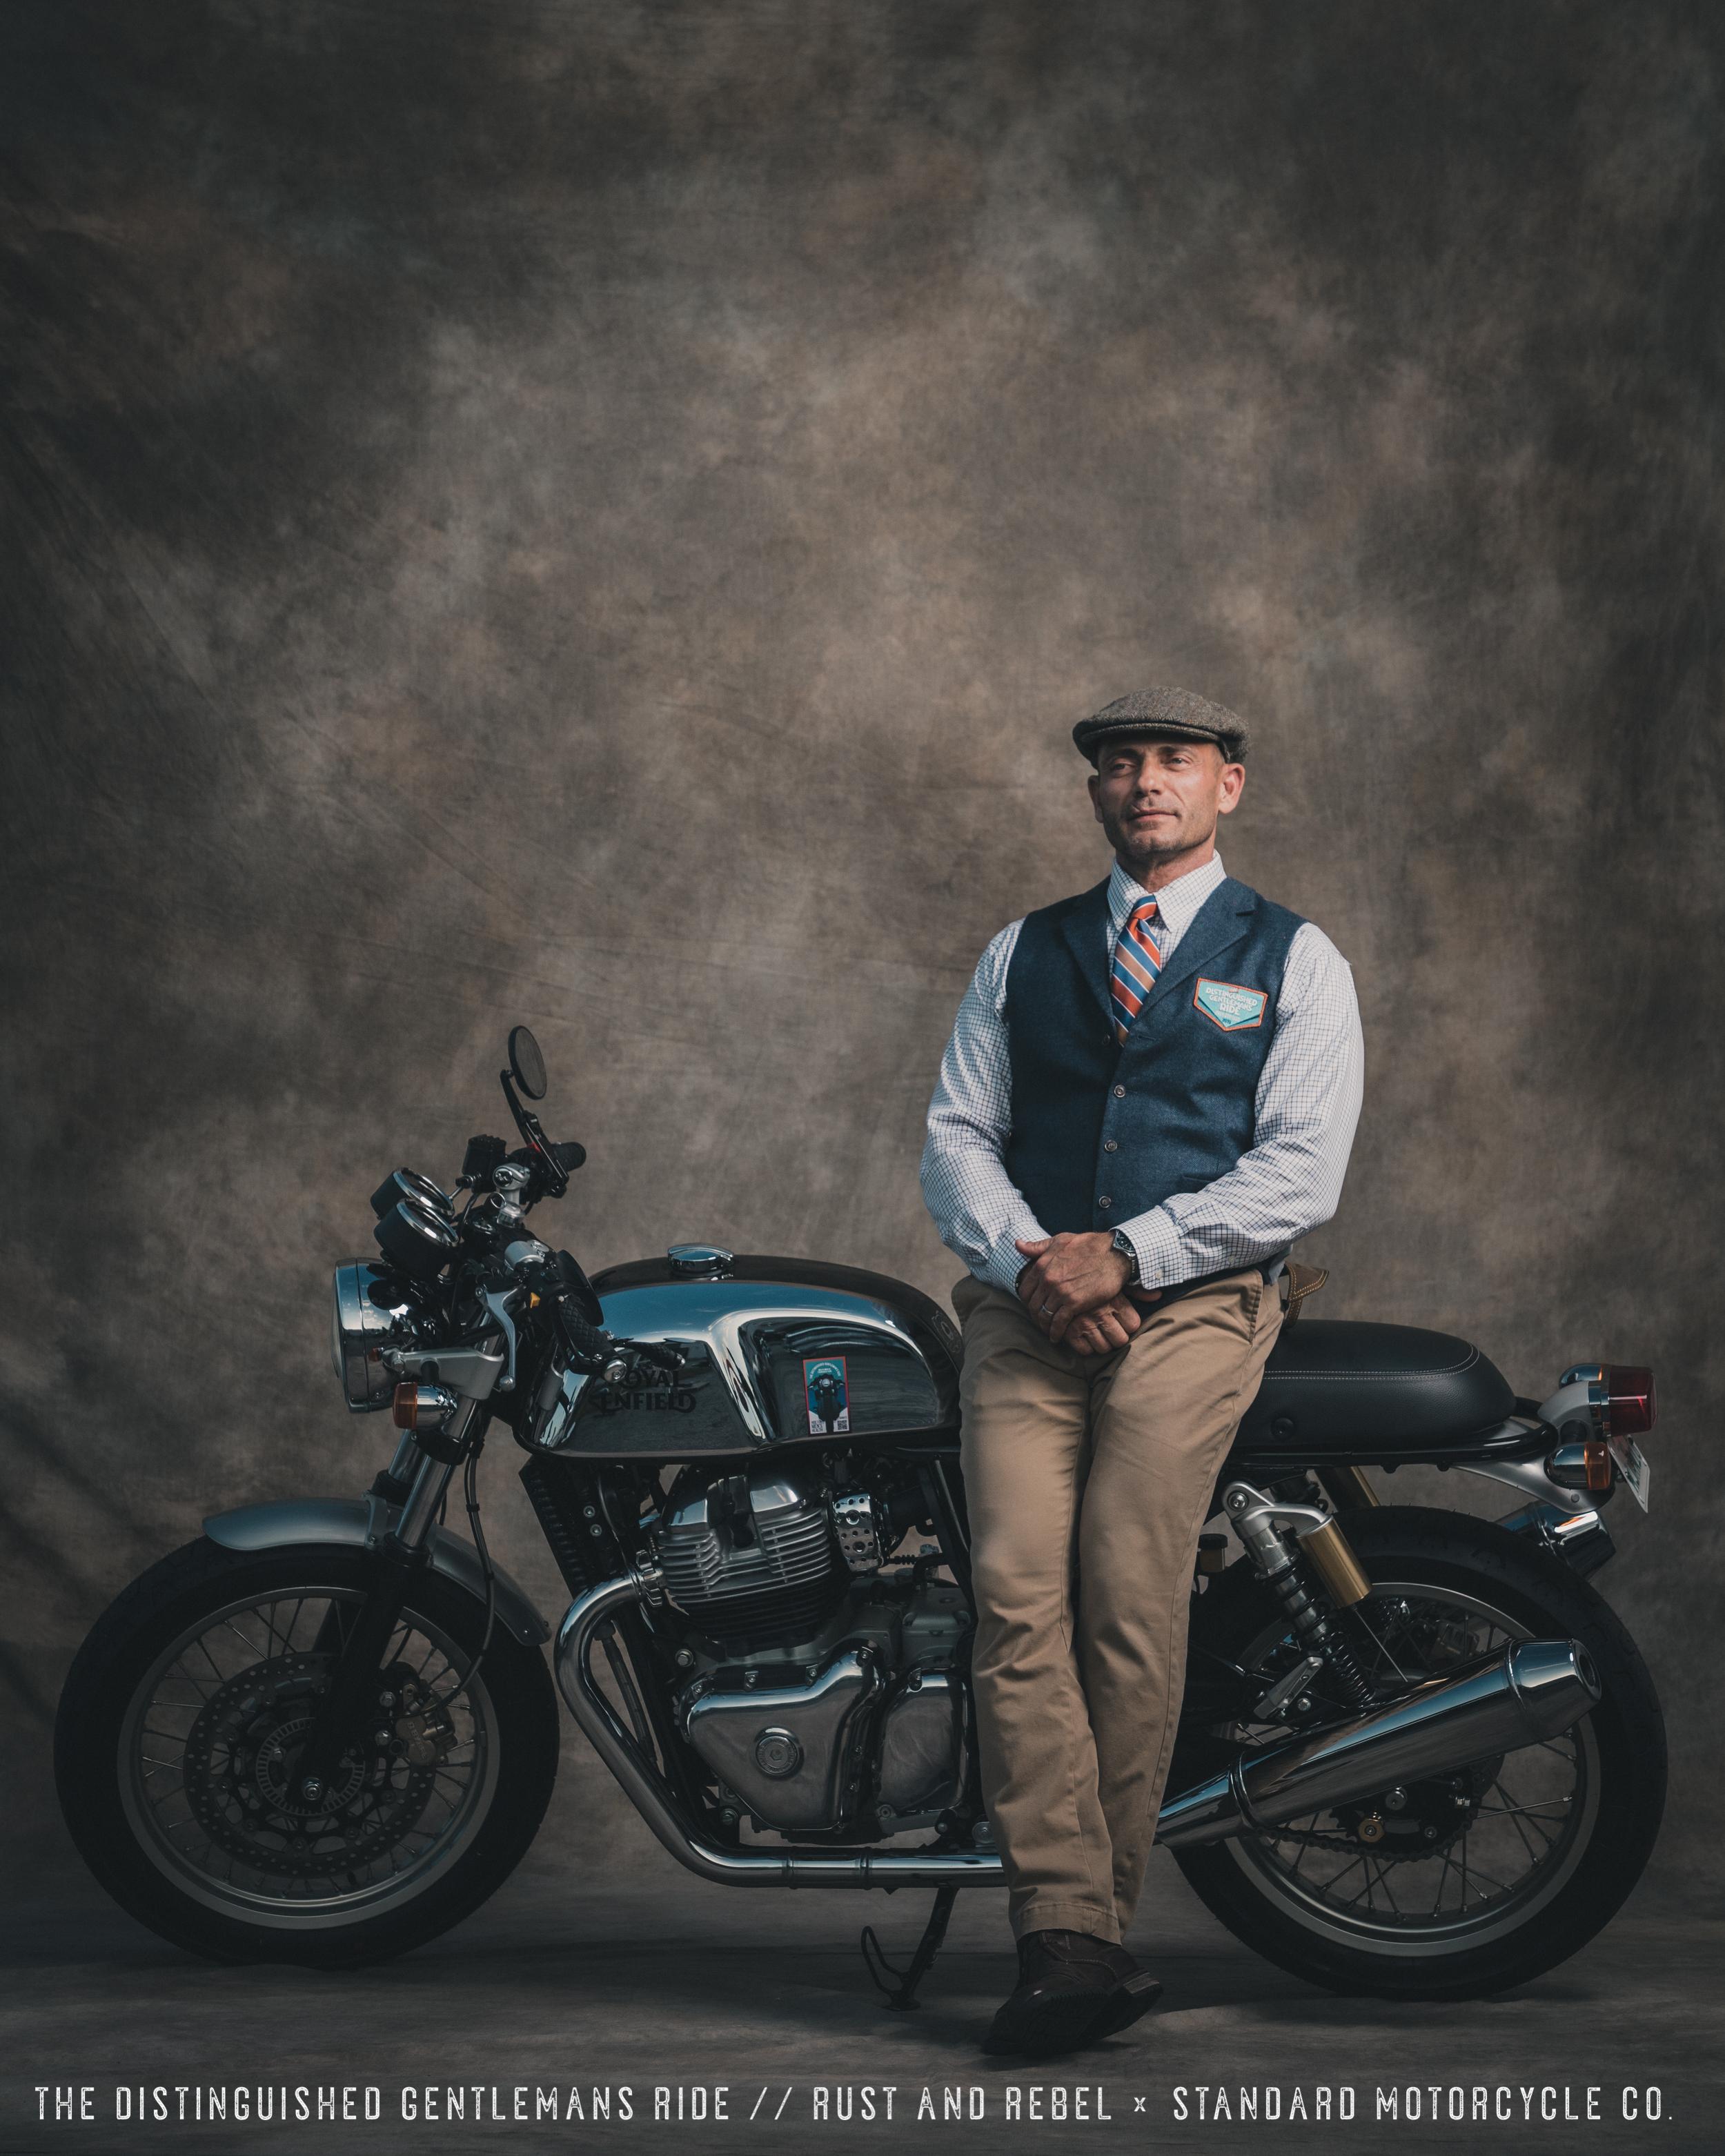 The Distinguished Gentleman's Ride 2019 [PEOPLE - PHOTO BY @MIKEDUNNUSA] - 0117.jpg